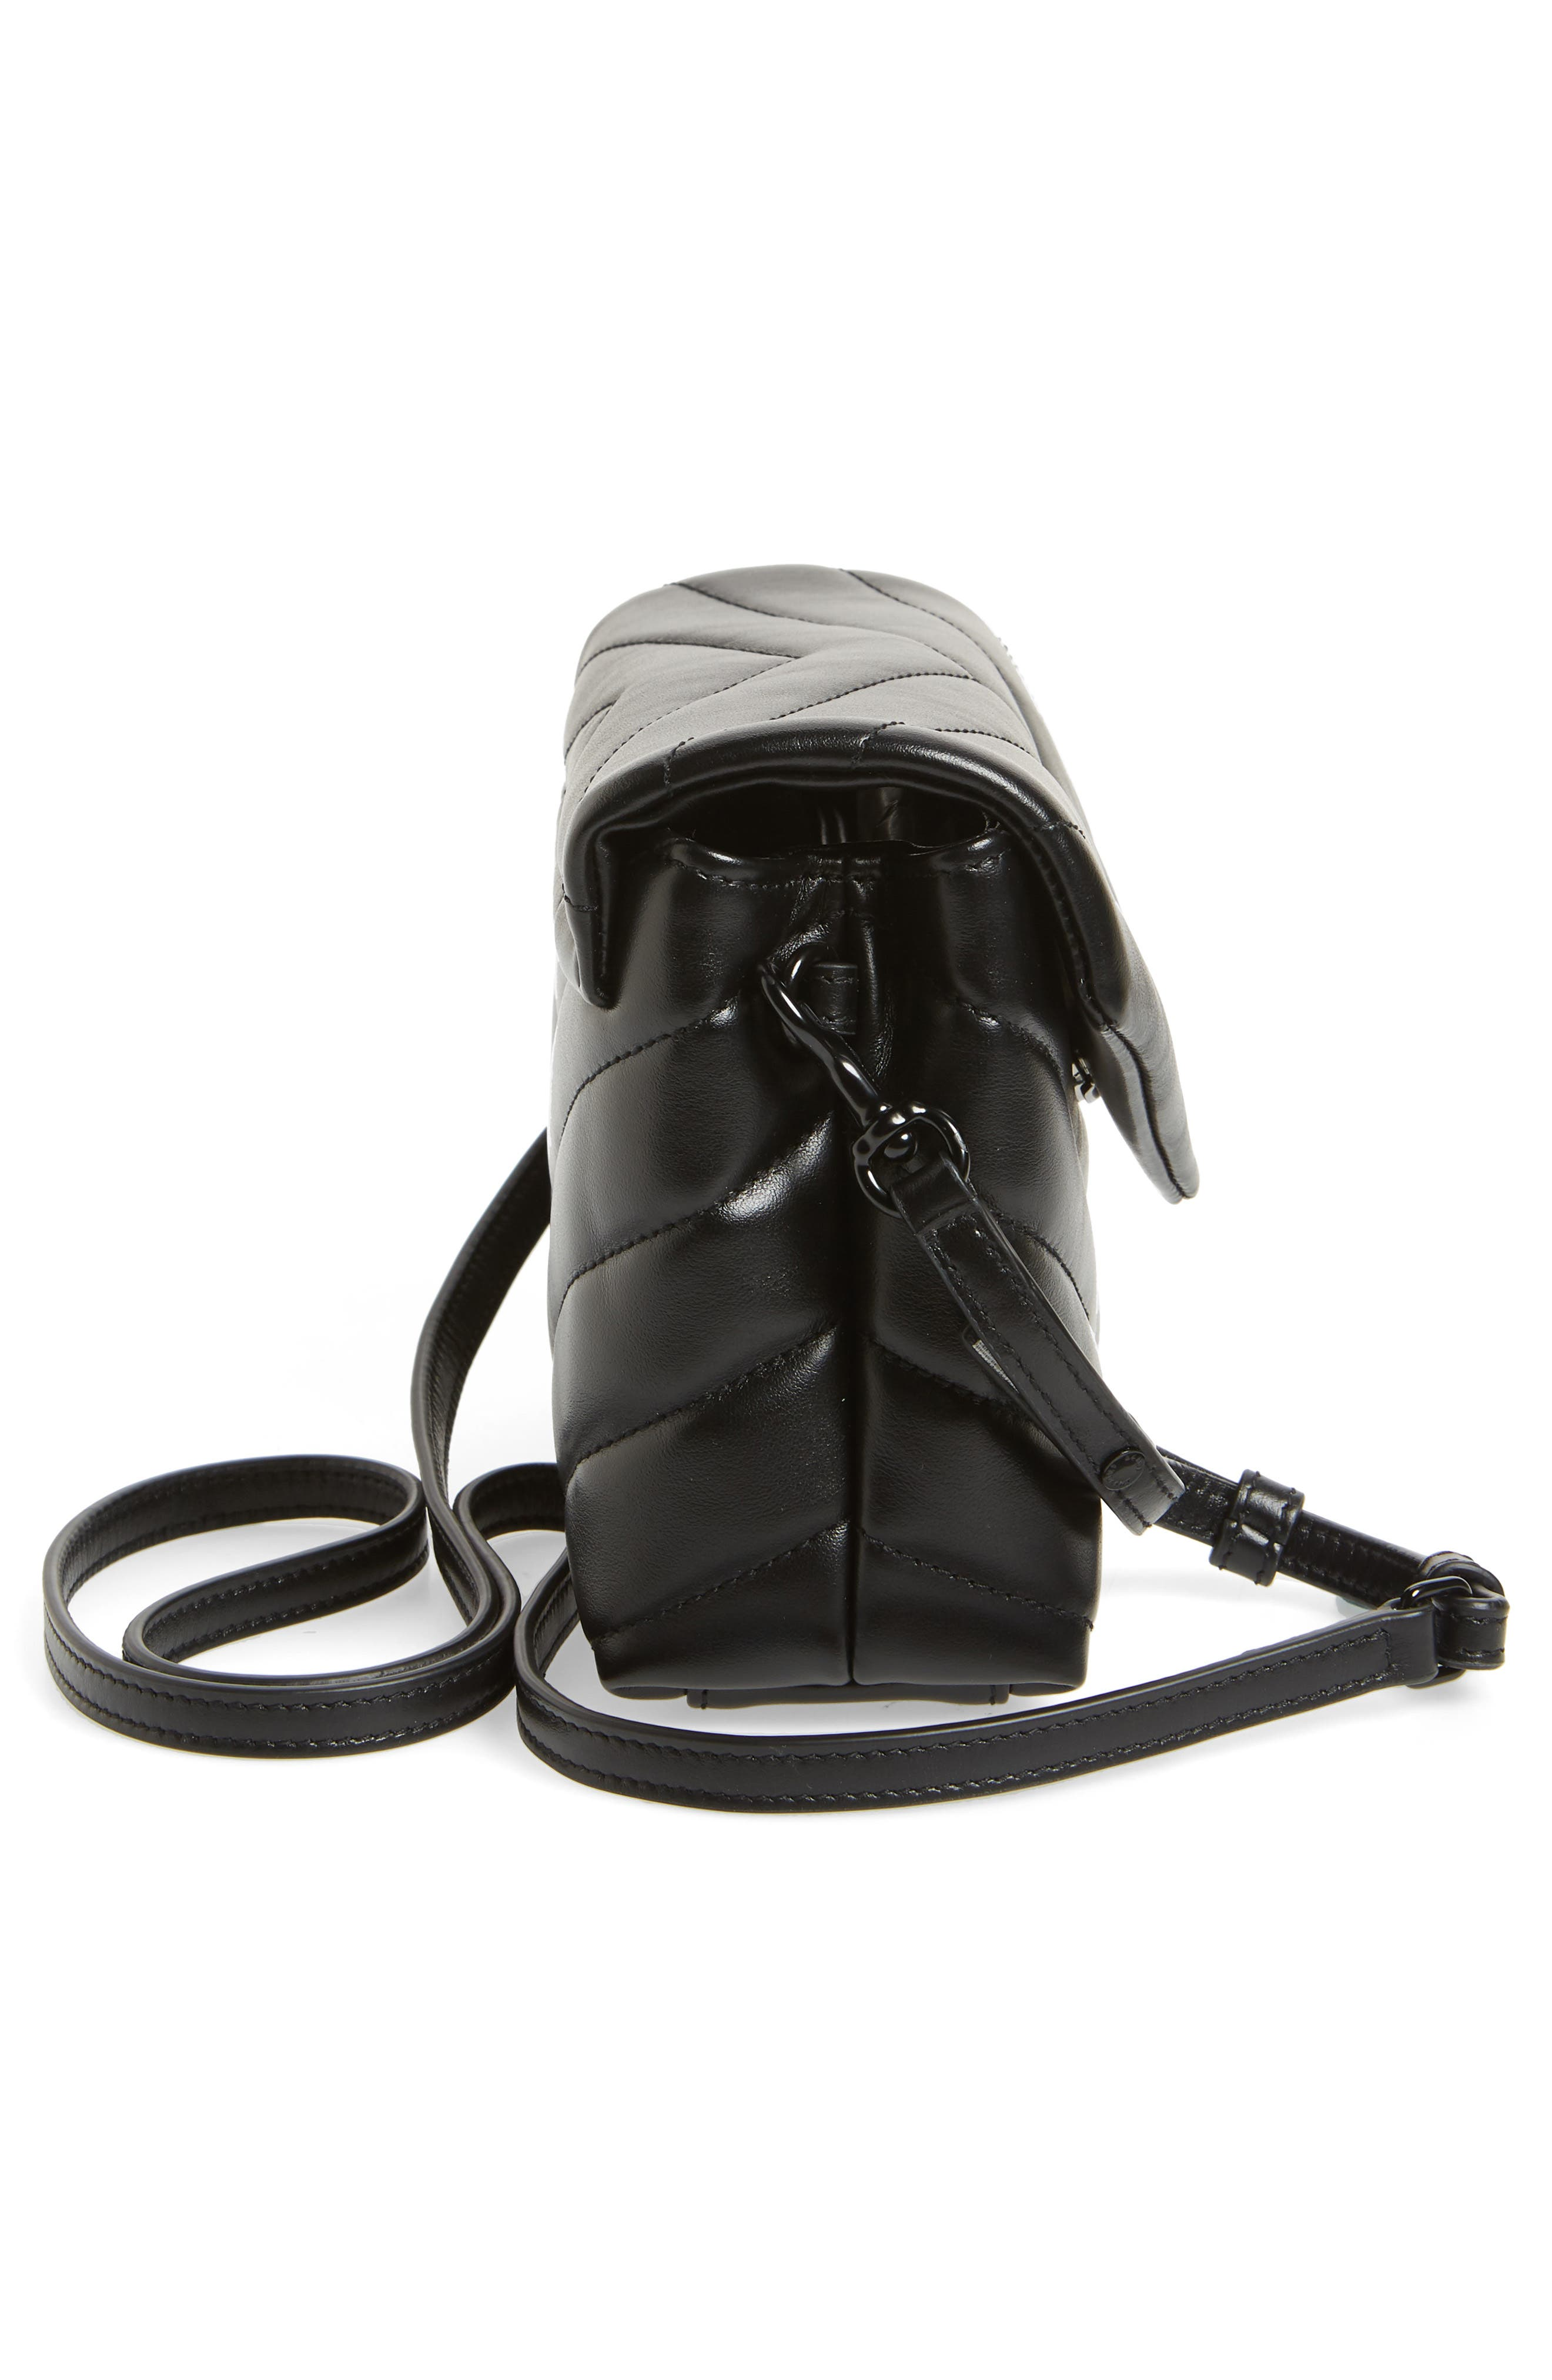 SAINT LAURENT, Toy Loulou Leather Crossbody Bag, Alternate thumbnail 5, color, 001